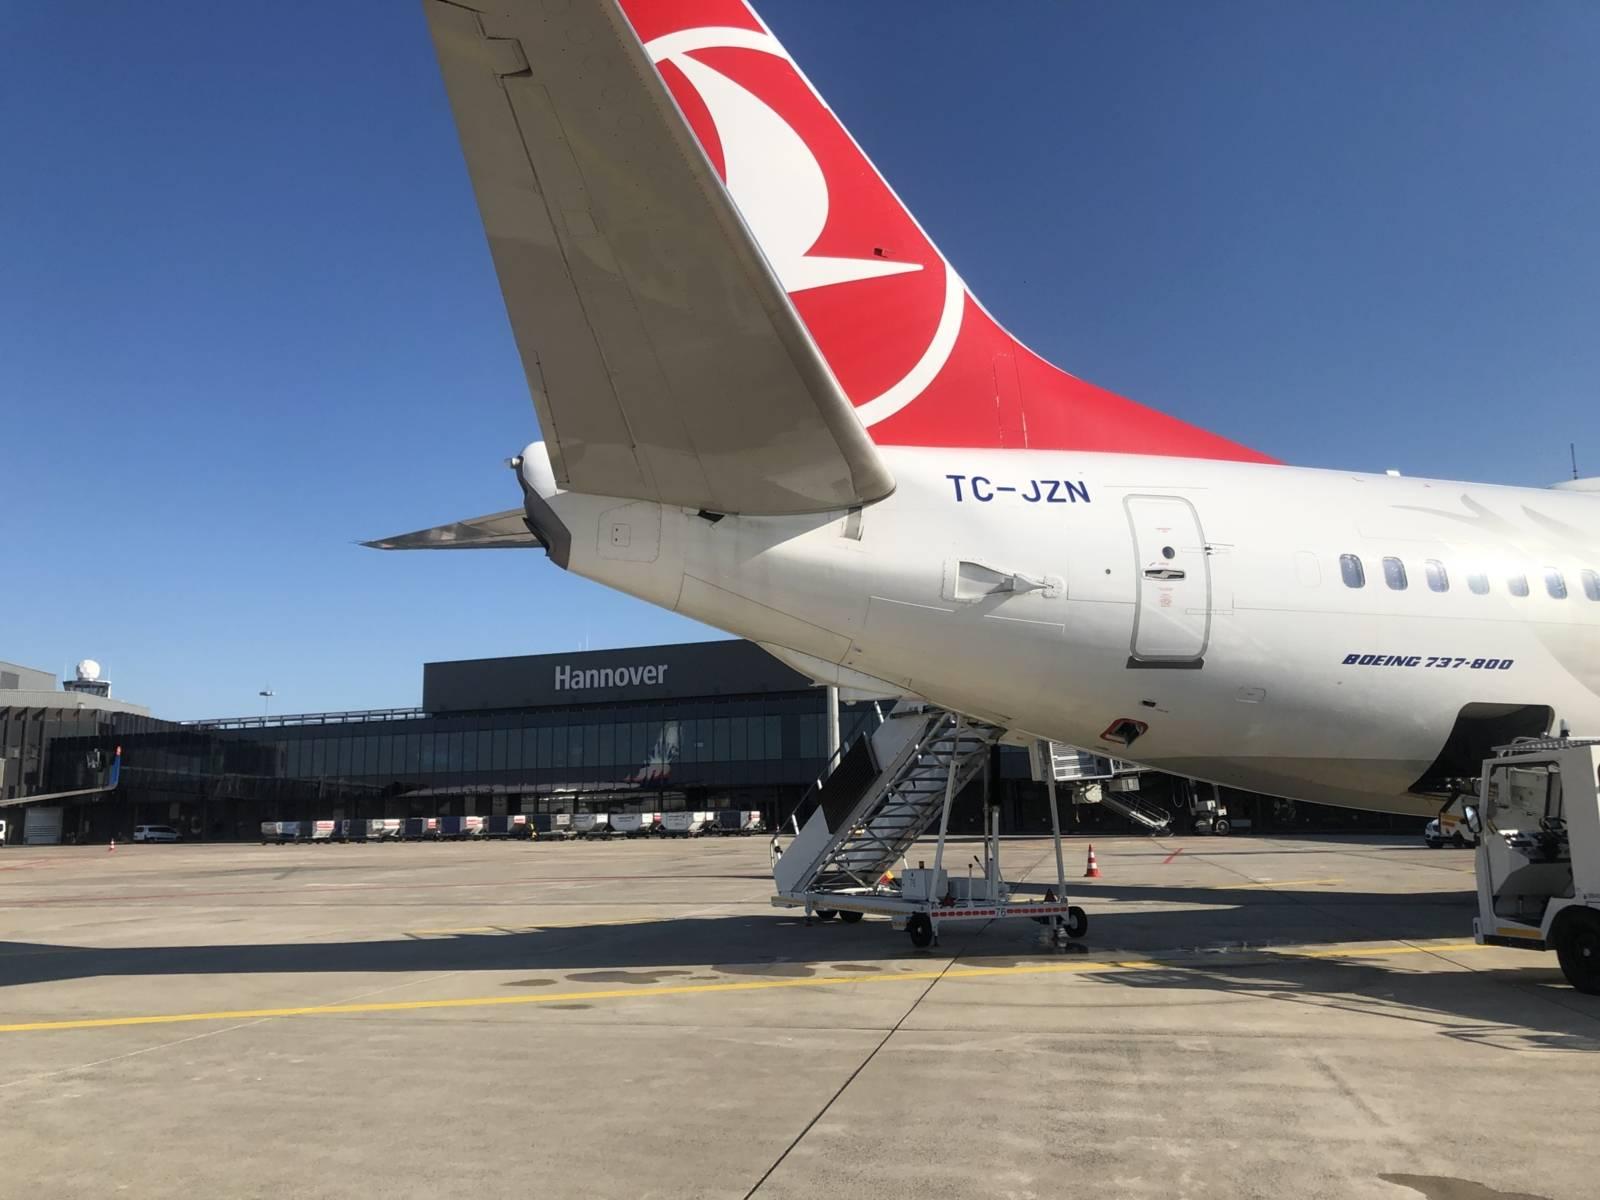 Flugzeug am Flughafen Hannover